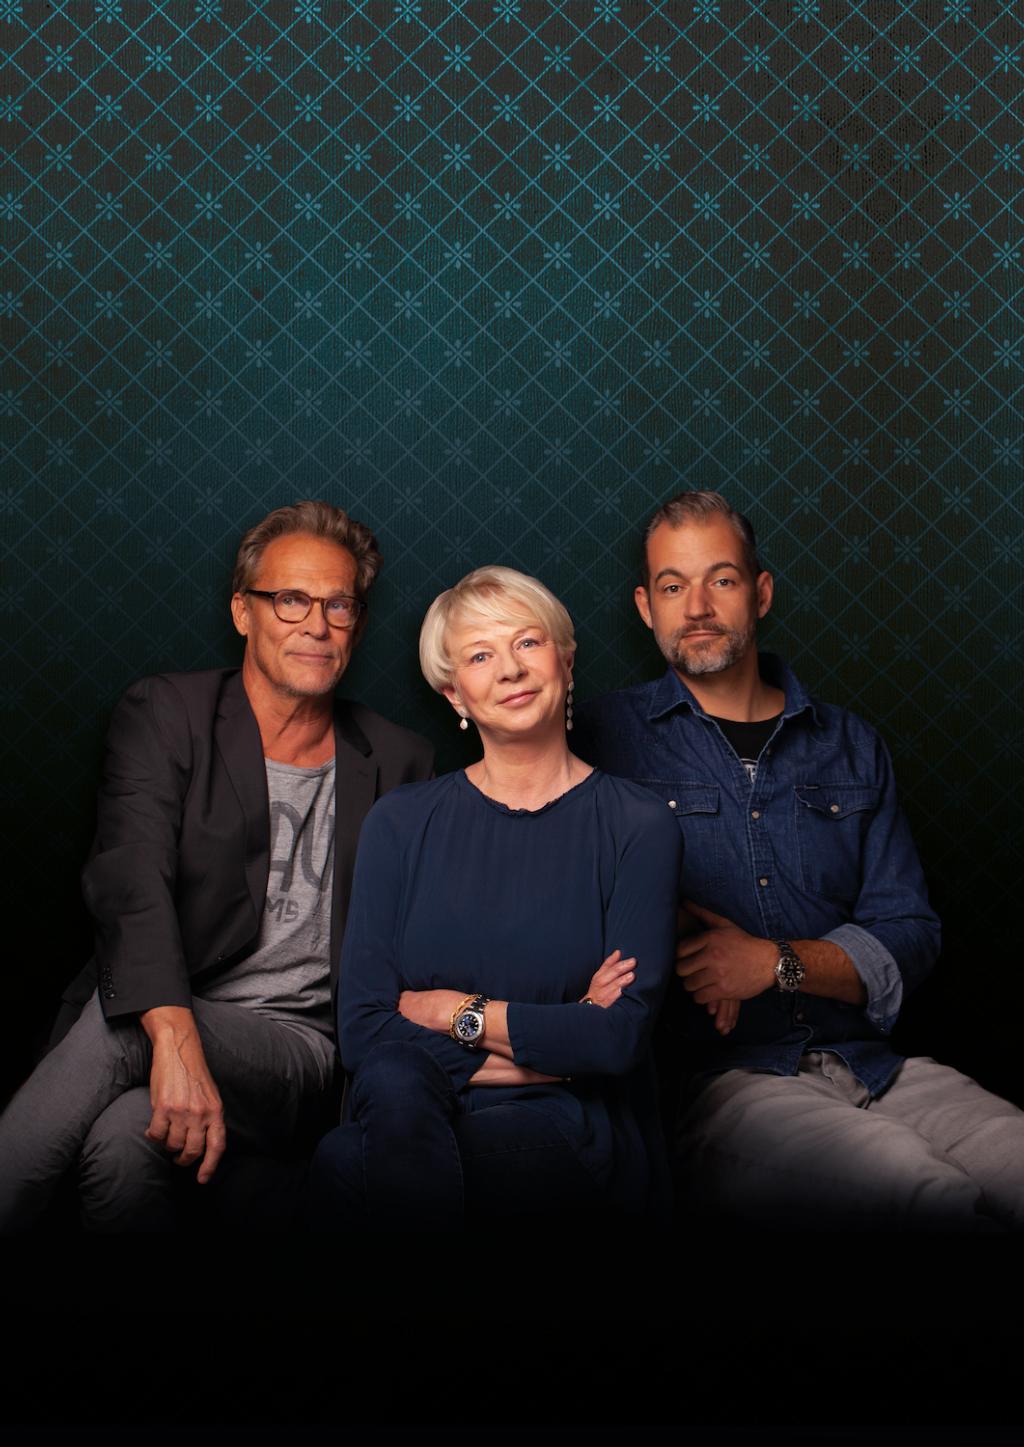 EBERHOFER unterwegs! mit: Rita Falk, Christian Tramitz und Florian Wagner